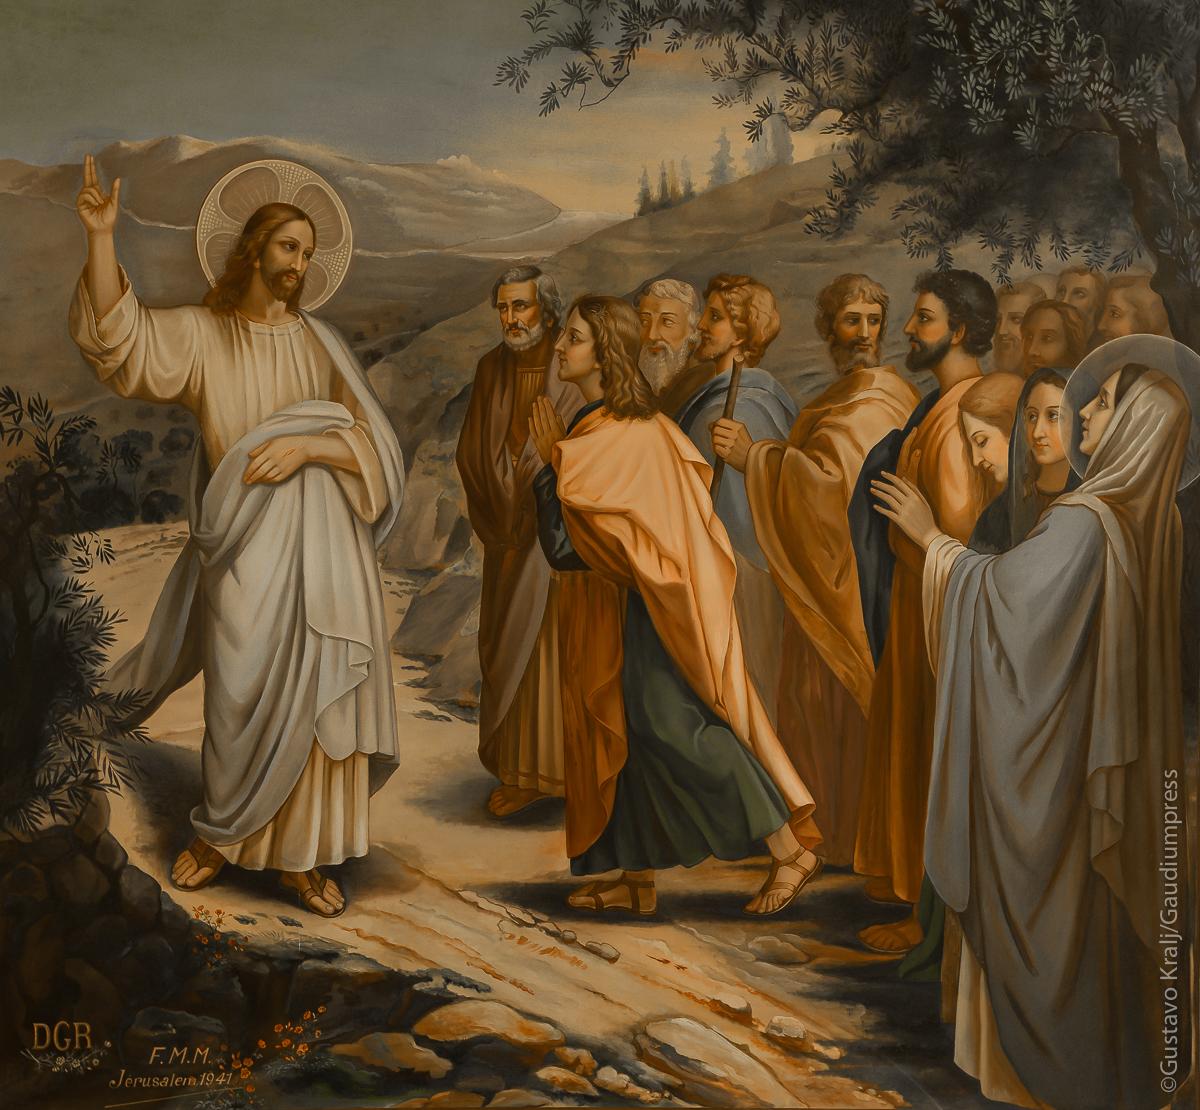 Jesús enseñando - Betania, Tierra Santa. Foto: Gustavo Kralj/Gaudiumpressimages